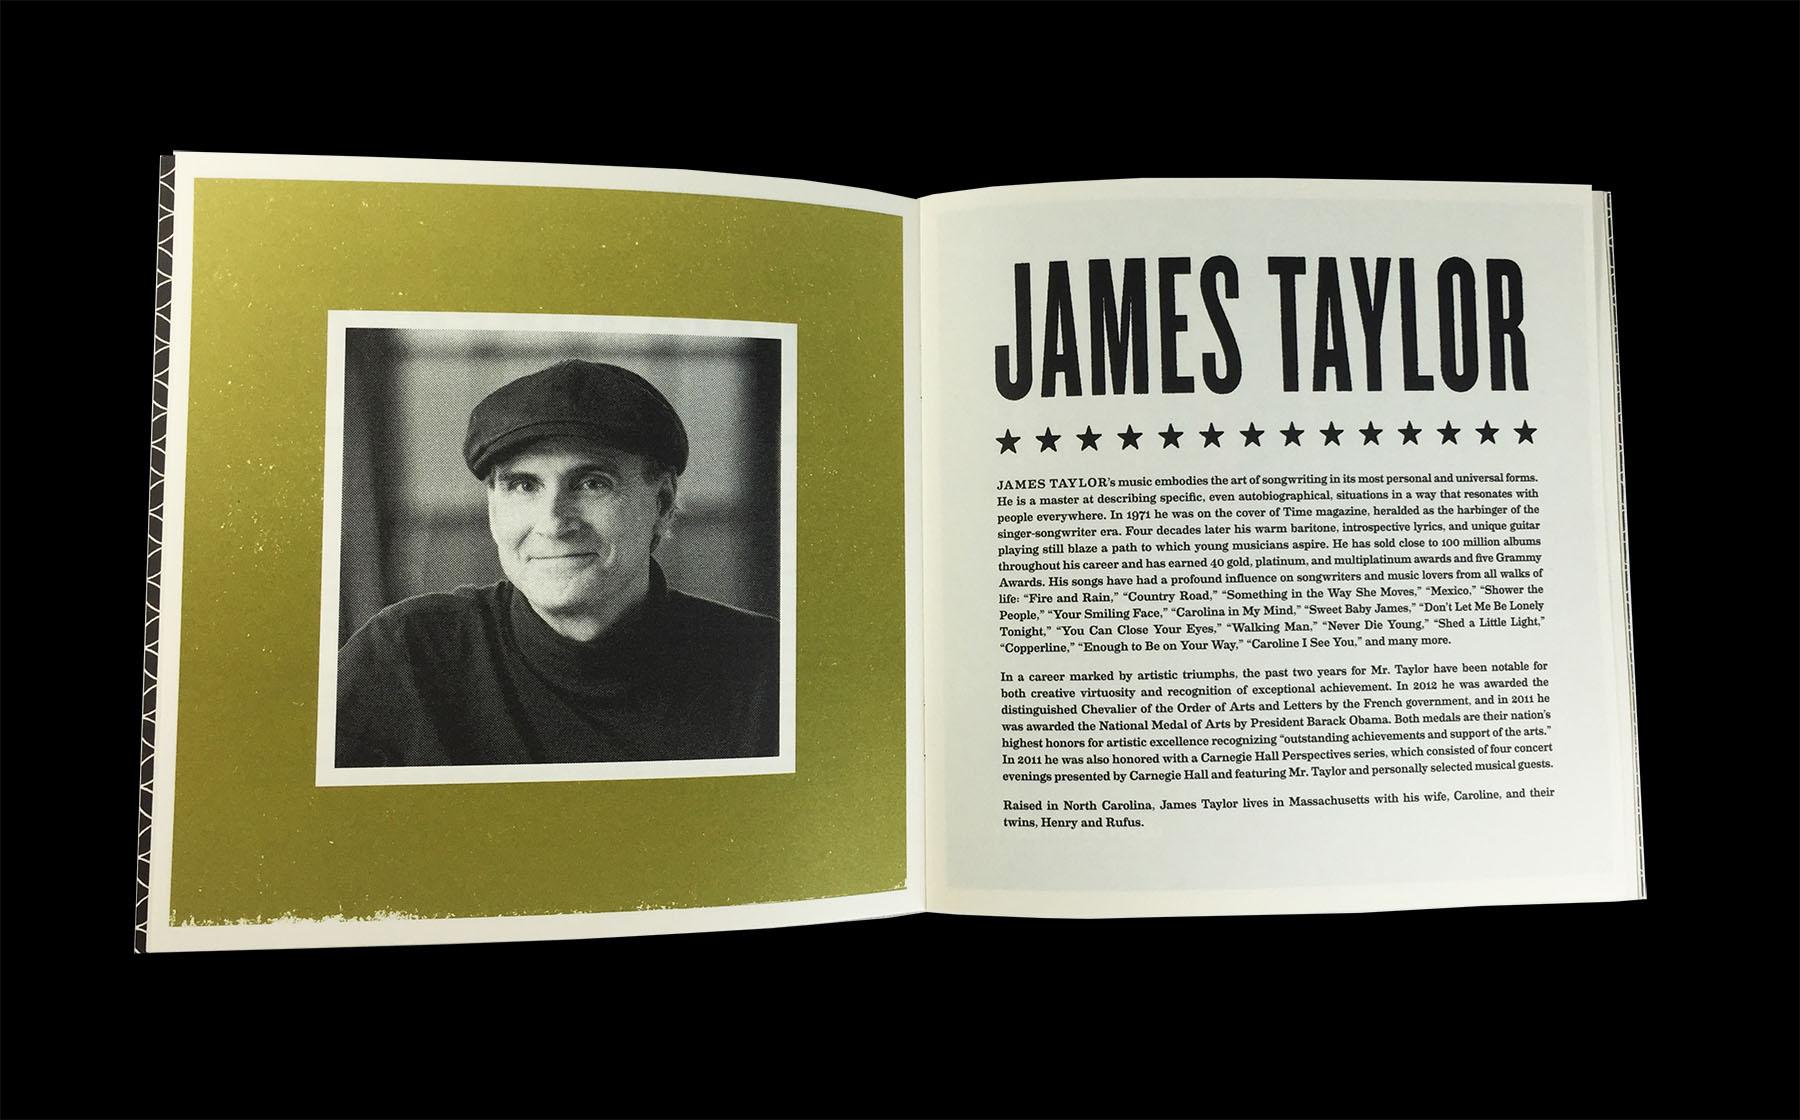 James Taylor Programs